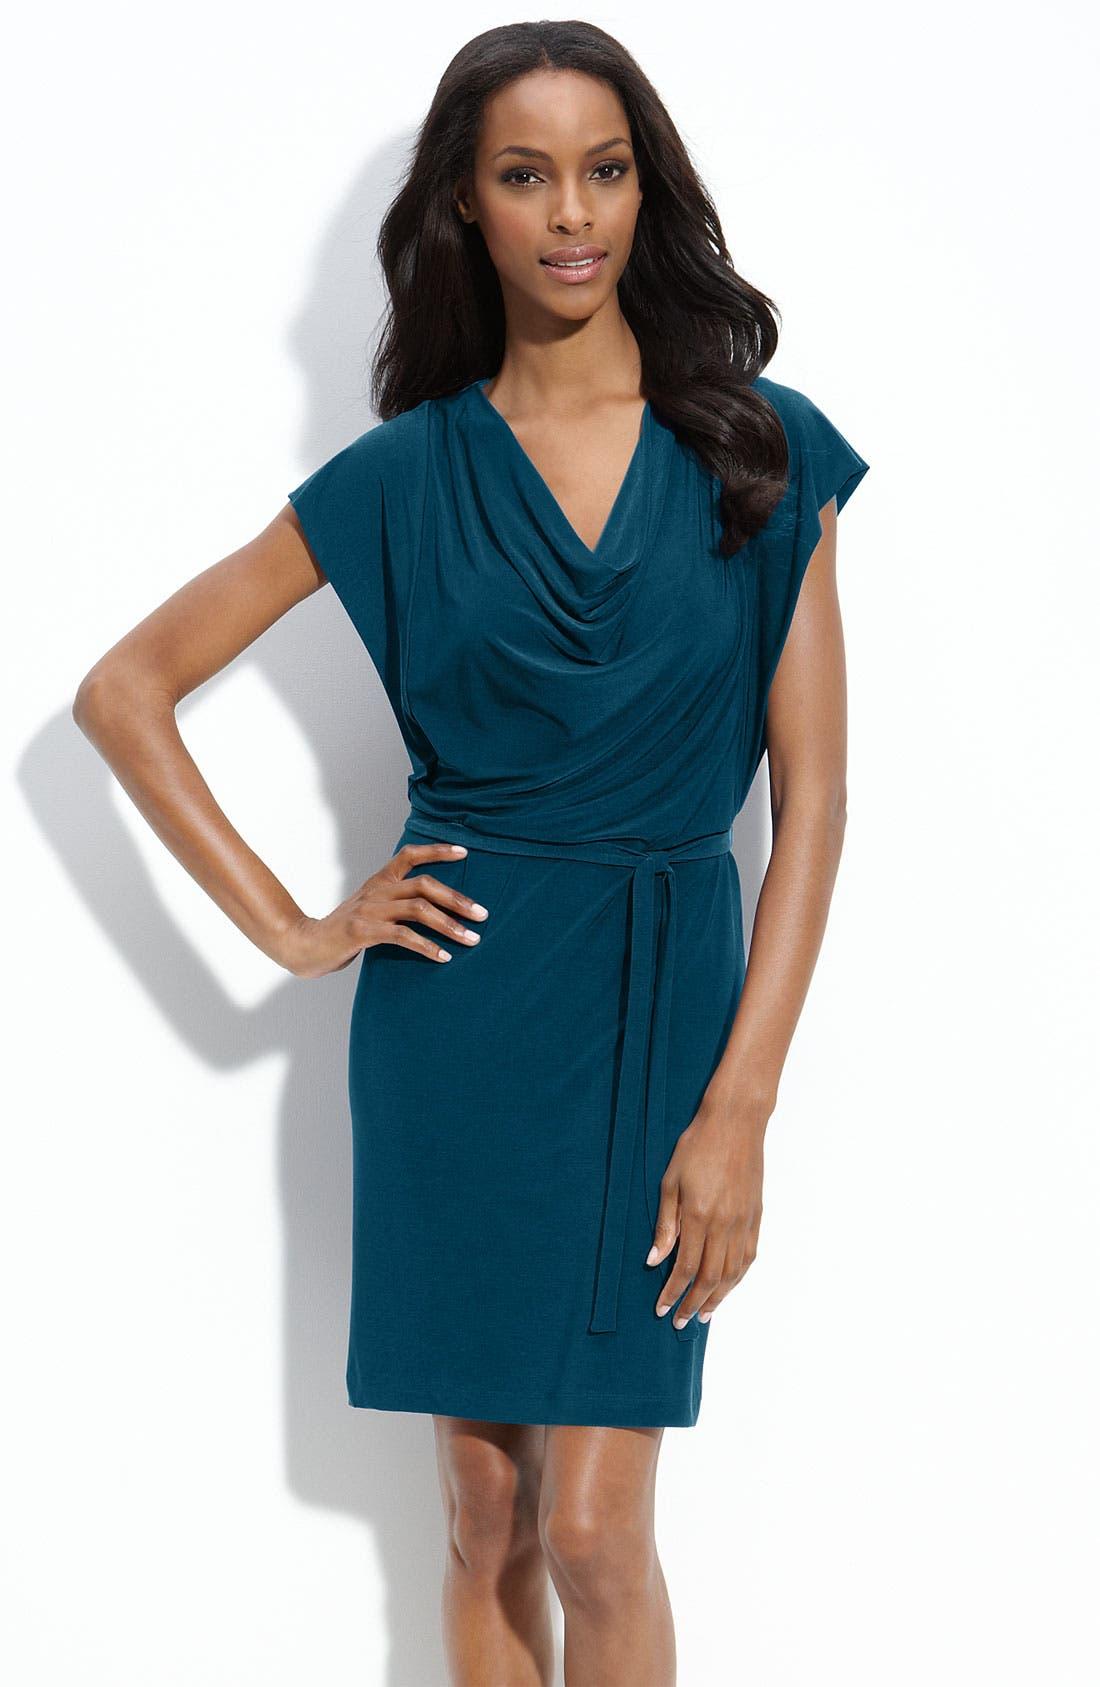 Alternate Image 1 Selected - Alex & Ava Jersey Sheath Dress